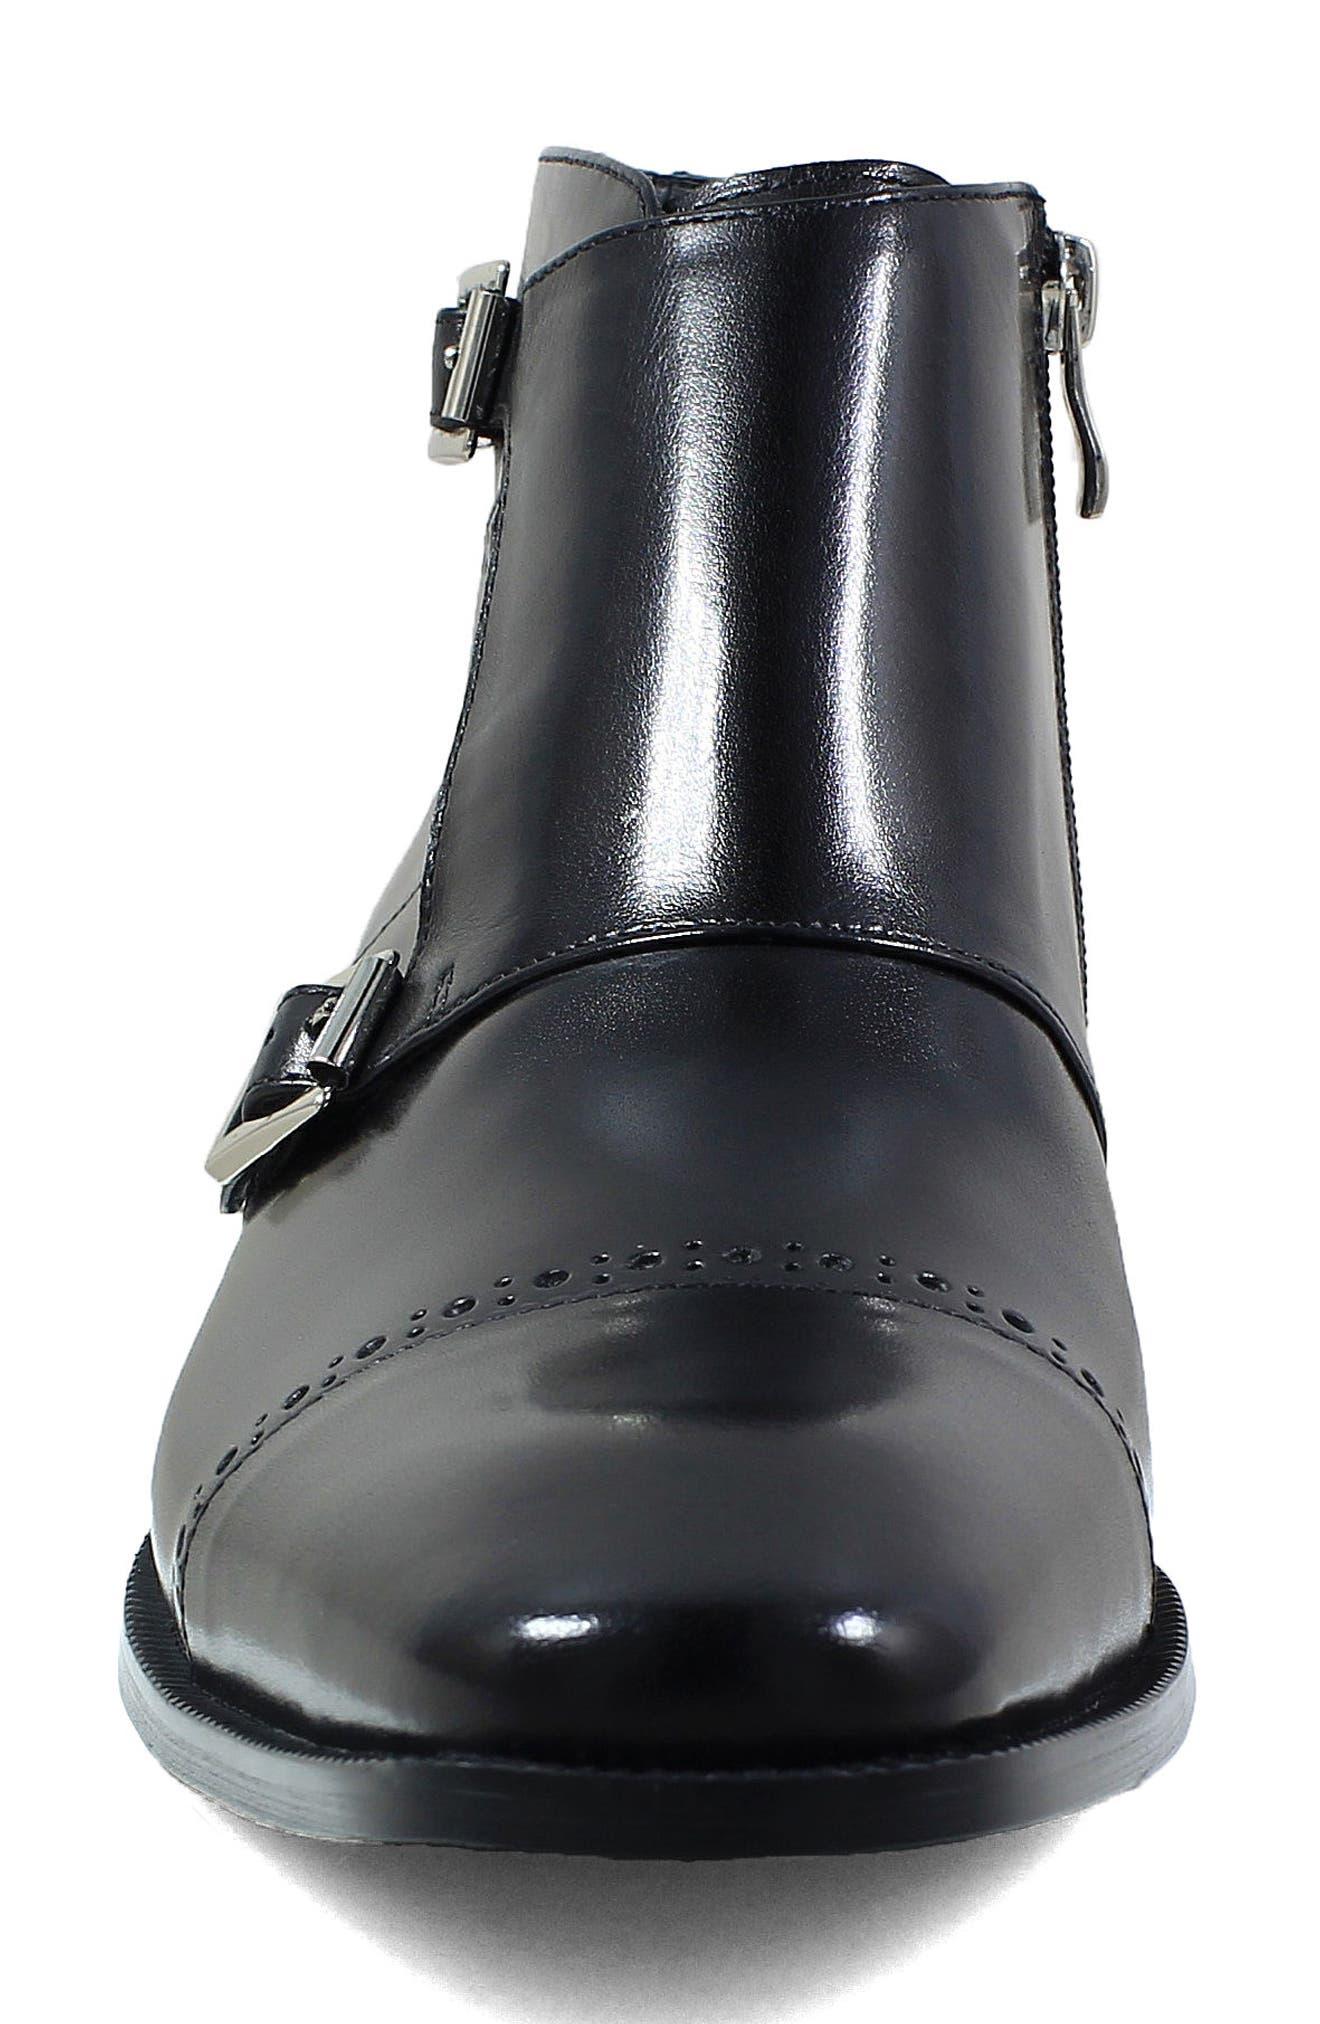 Kason Double Monk Strap Boot,                             Alternate thumbnail 5, color,                             Black Leather